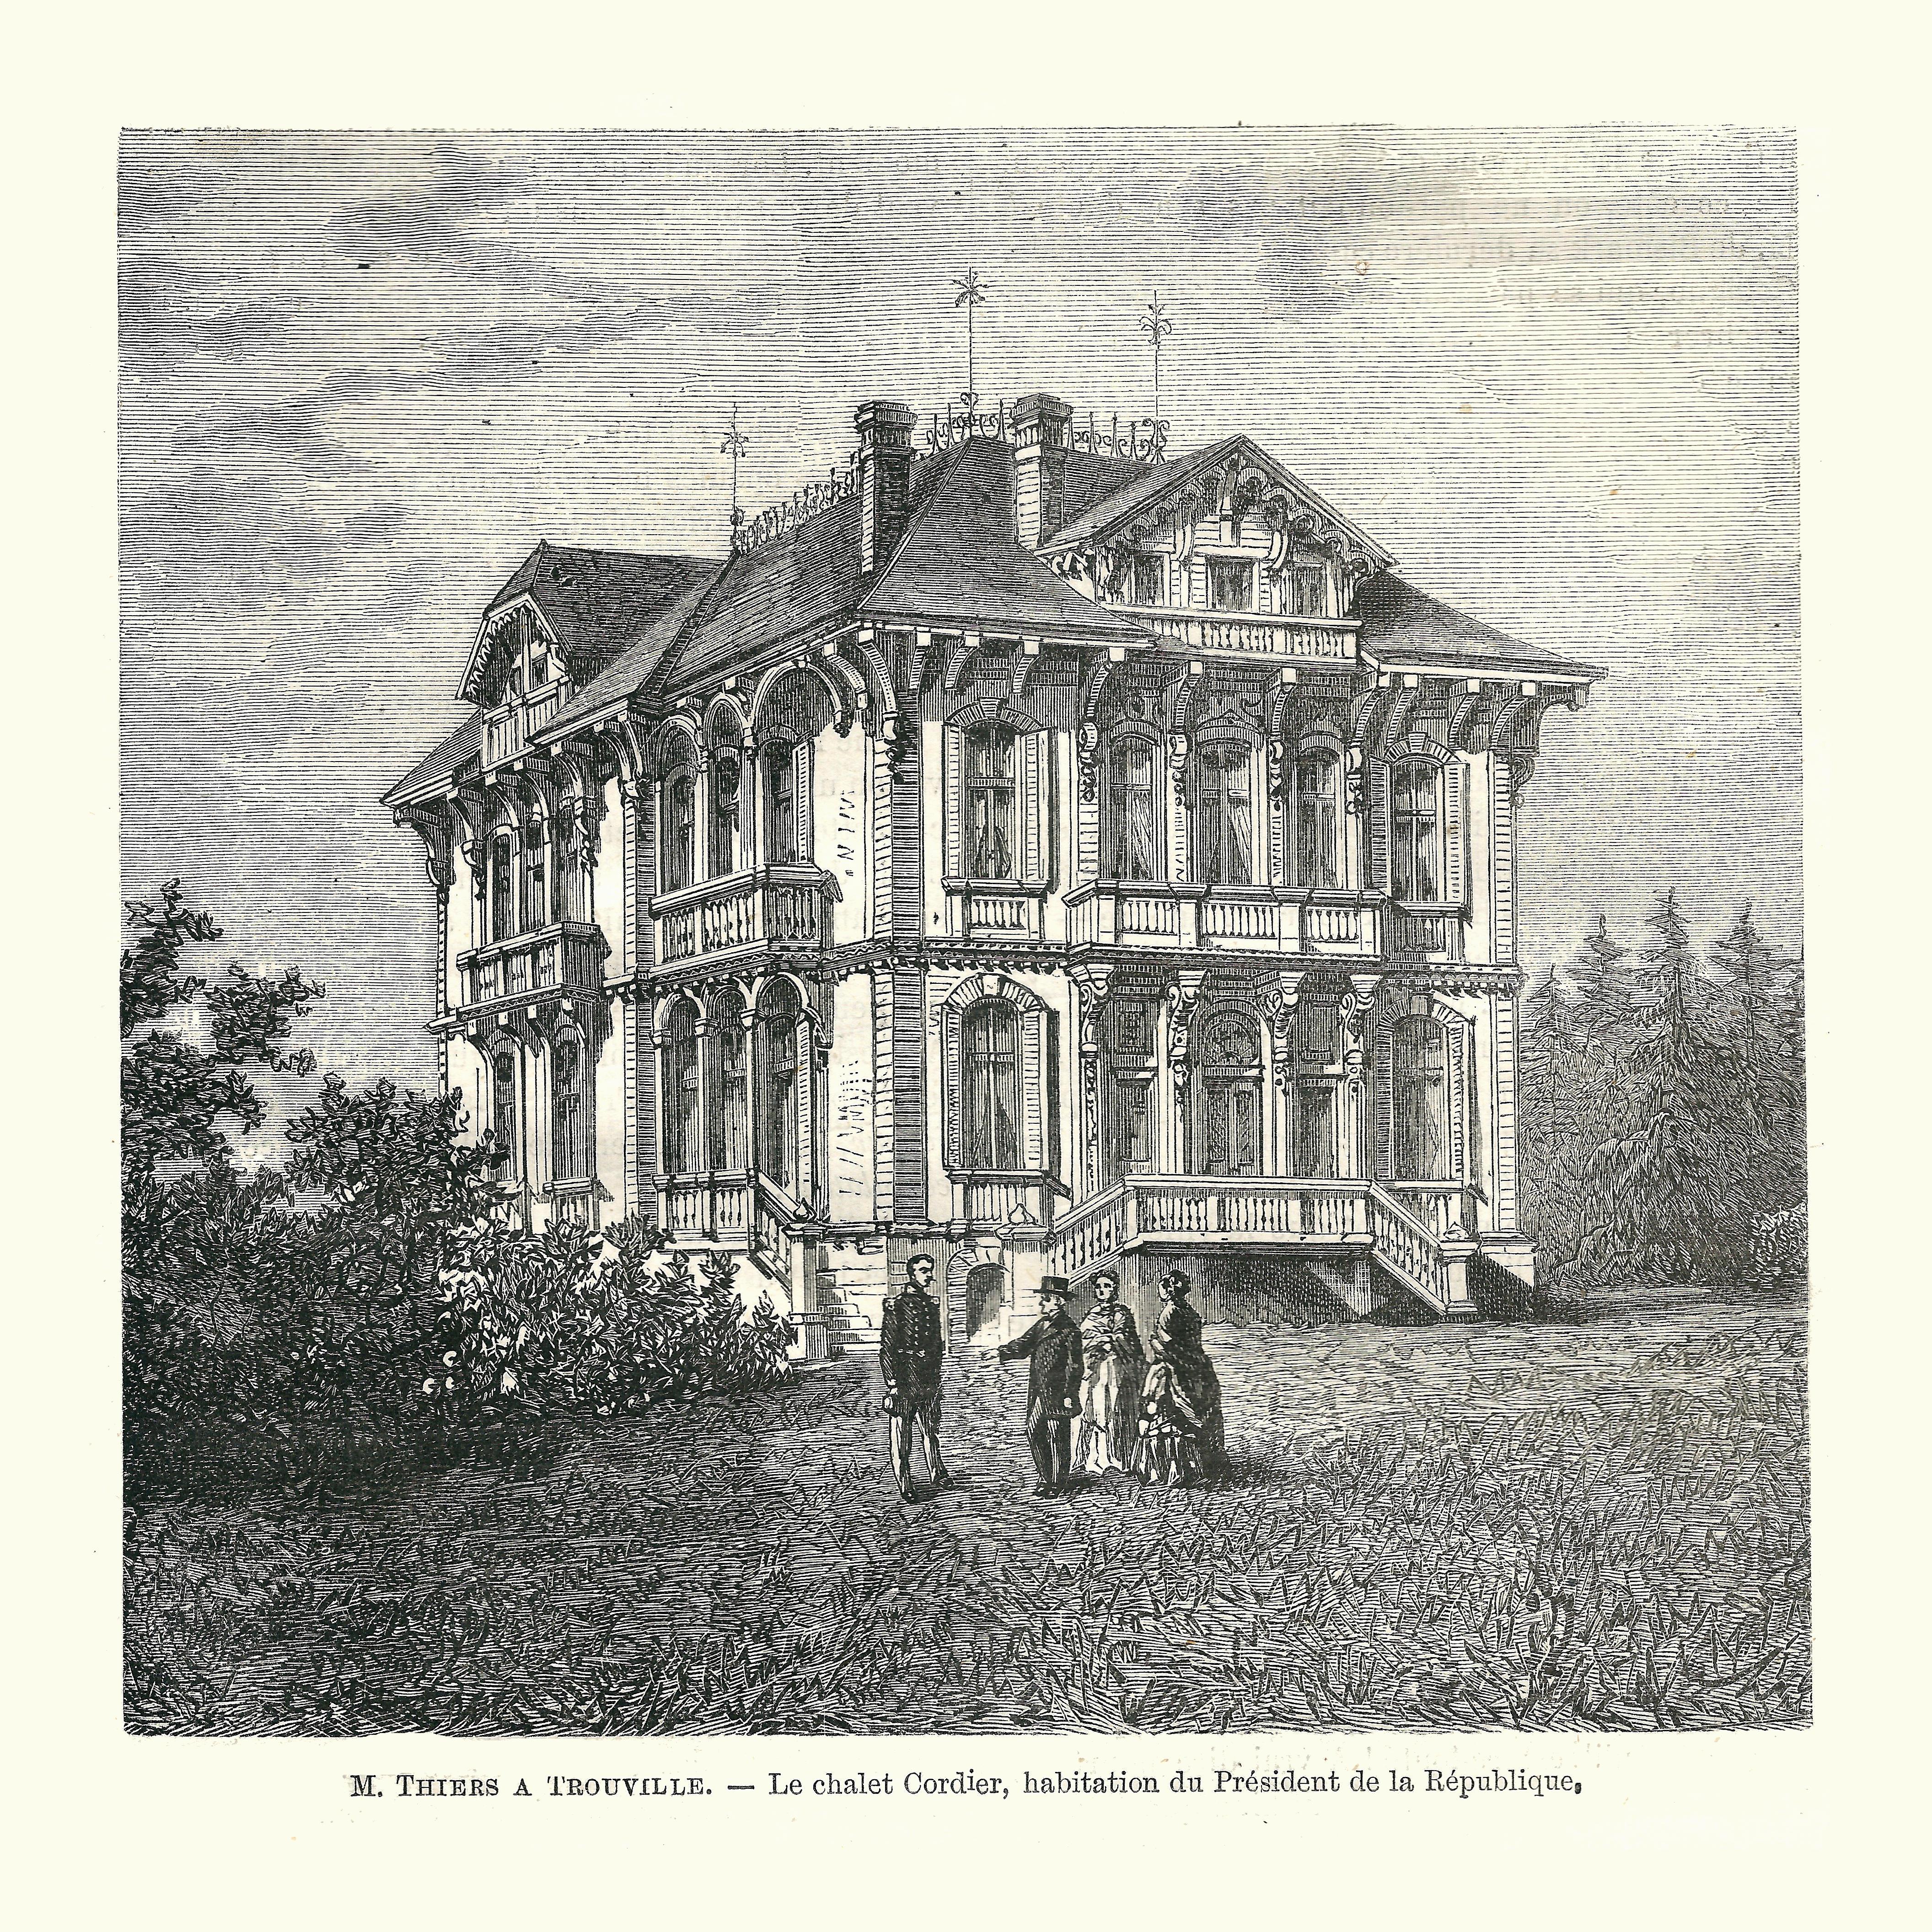 https://upload.wikimedia.org/wikipedia/commons/e/ec/Trouville-sur-Mer-FR-14-chalet_Cordier-gravure.jpg